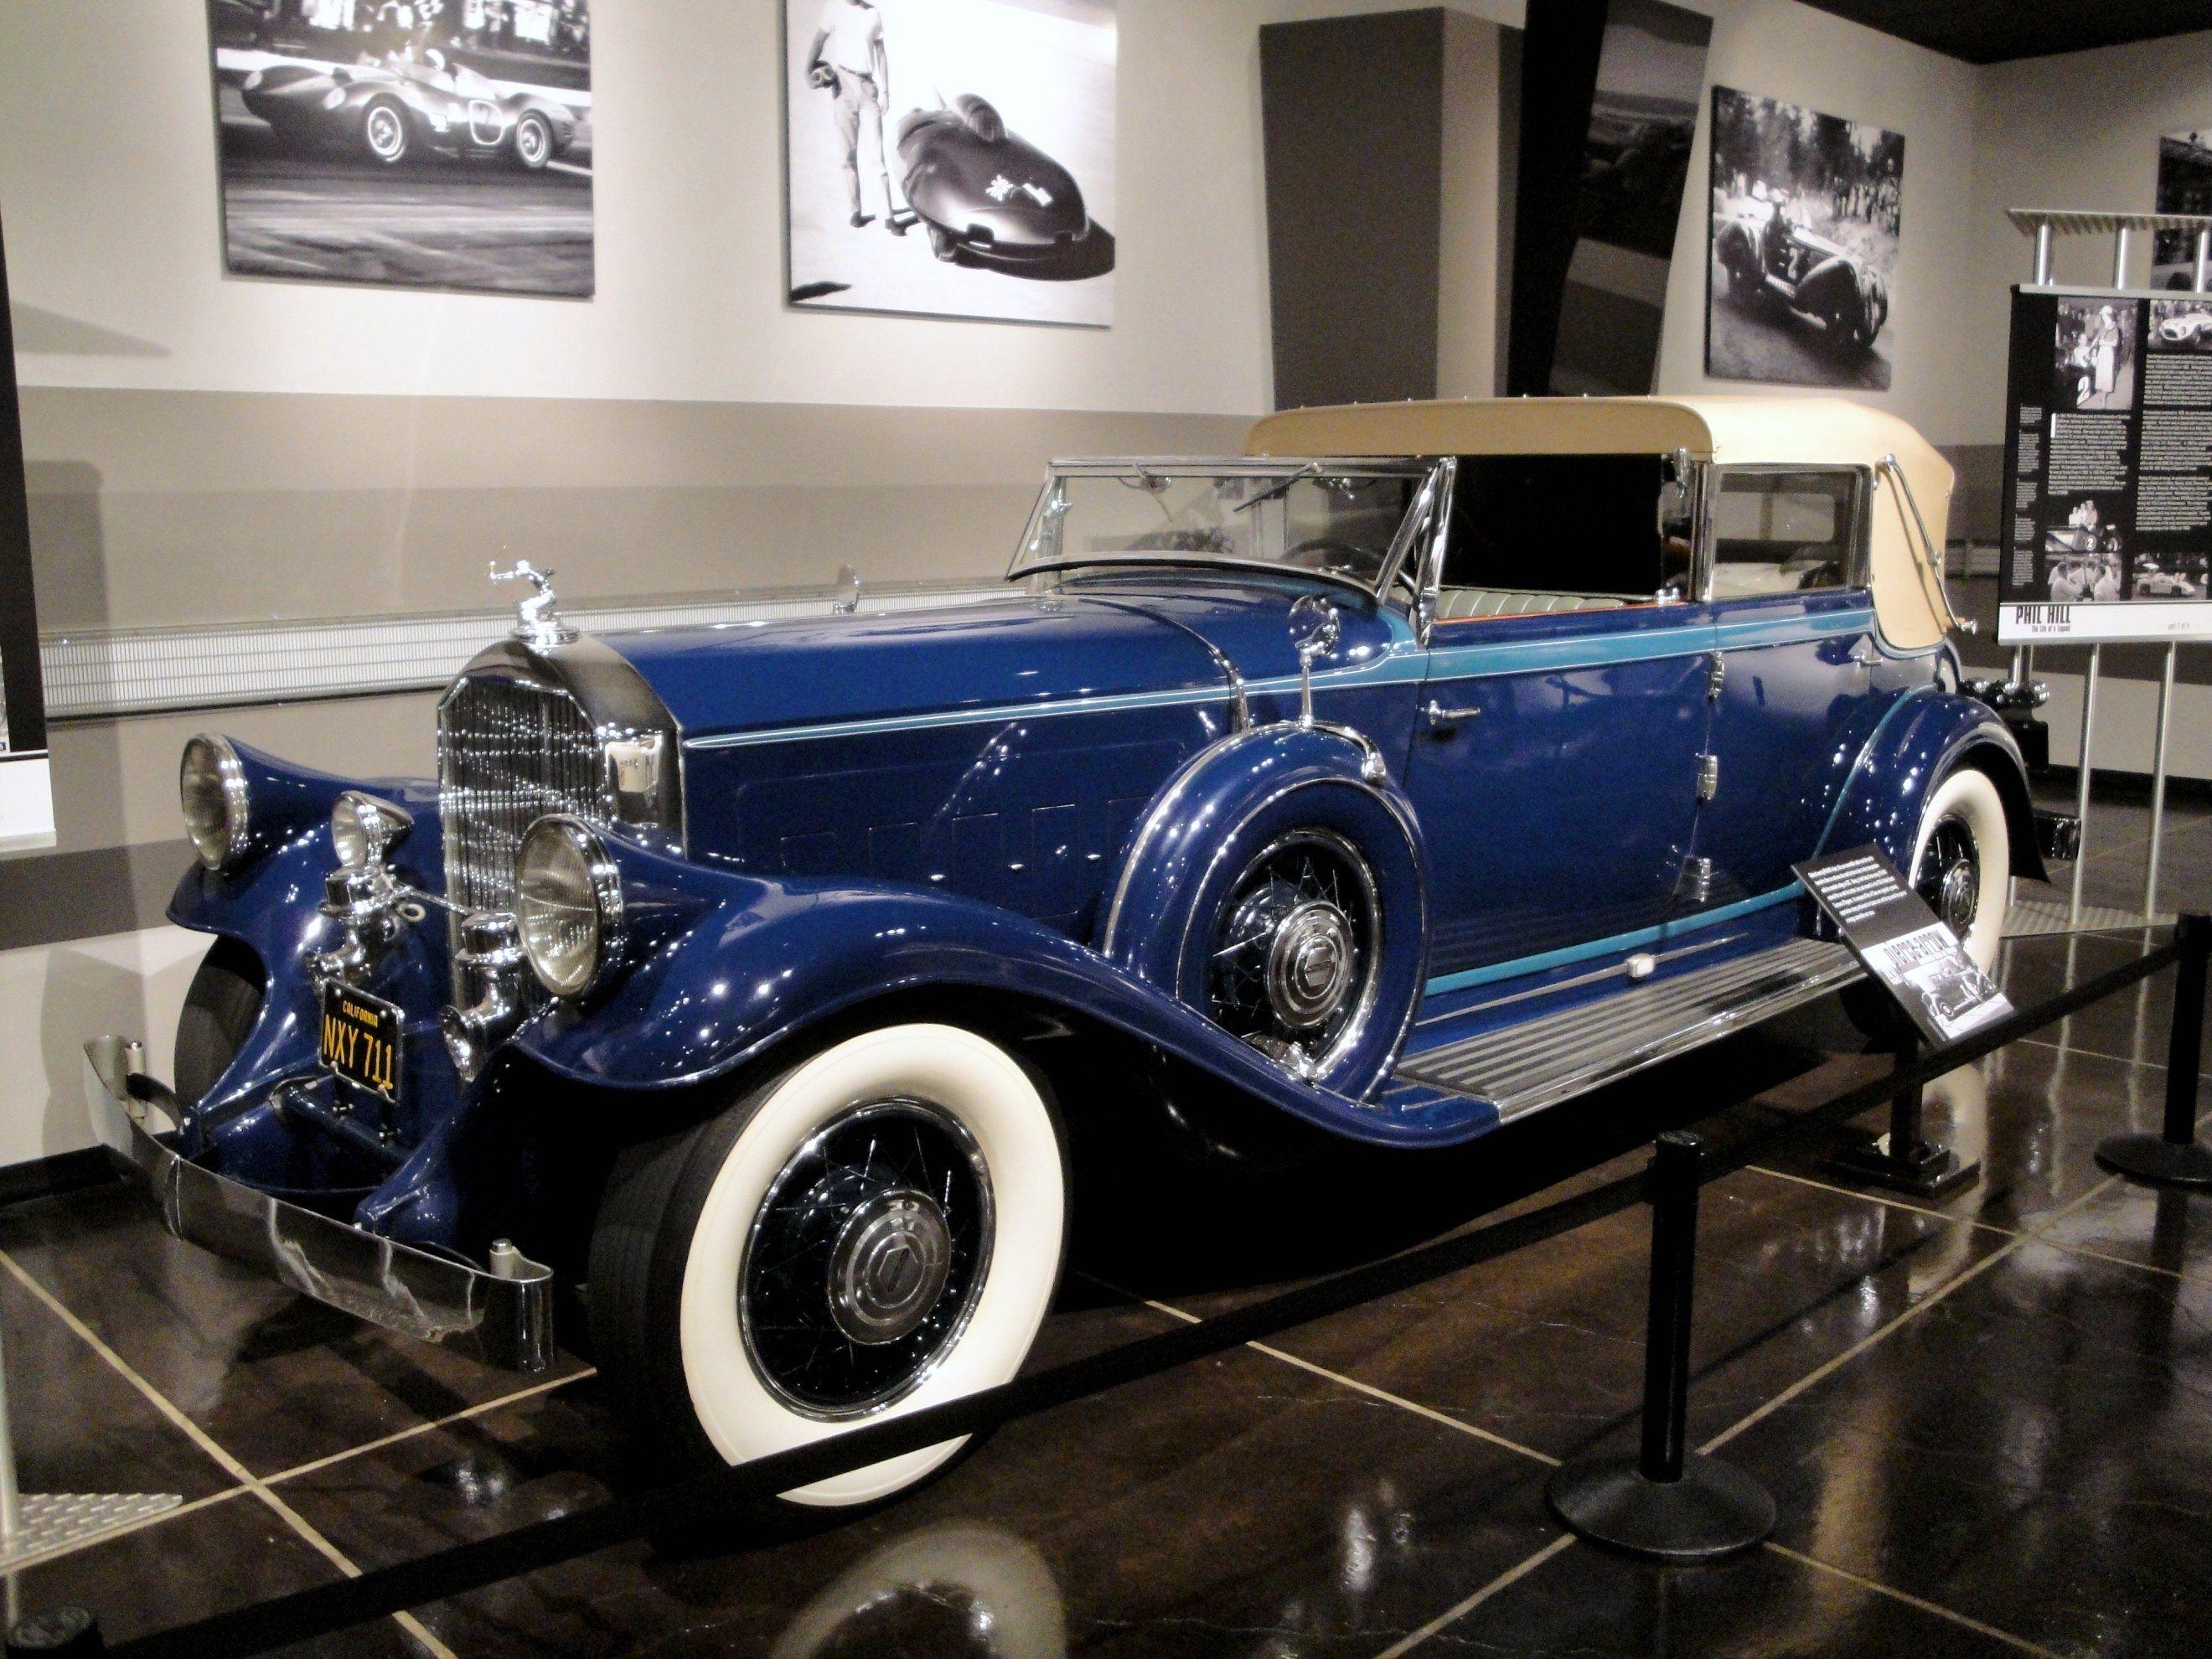 1931 Pierce-Arrow with body by LeBaron. A classic car ... | sick ...